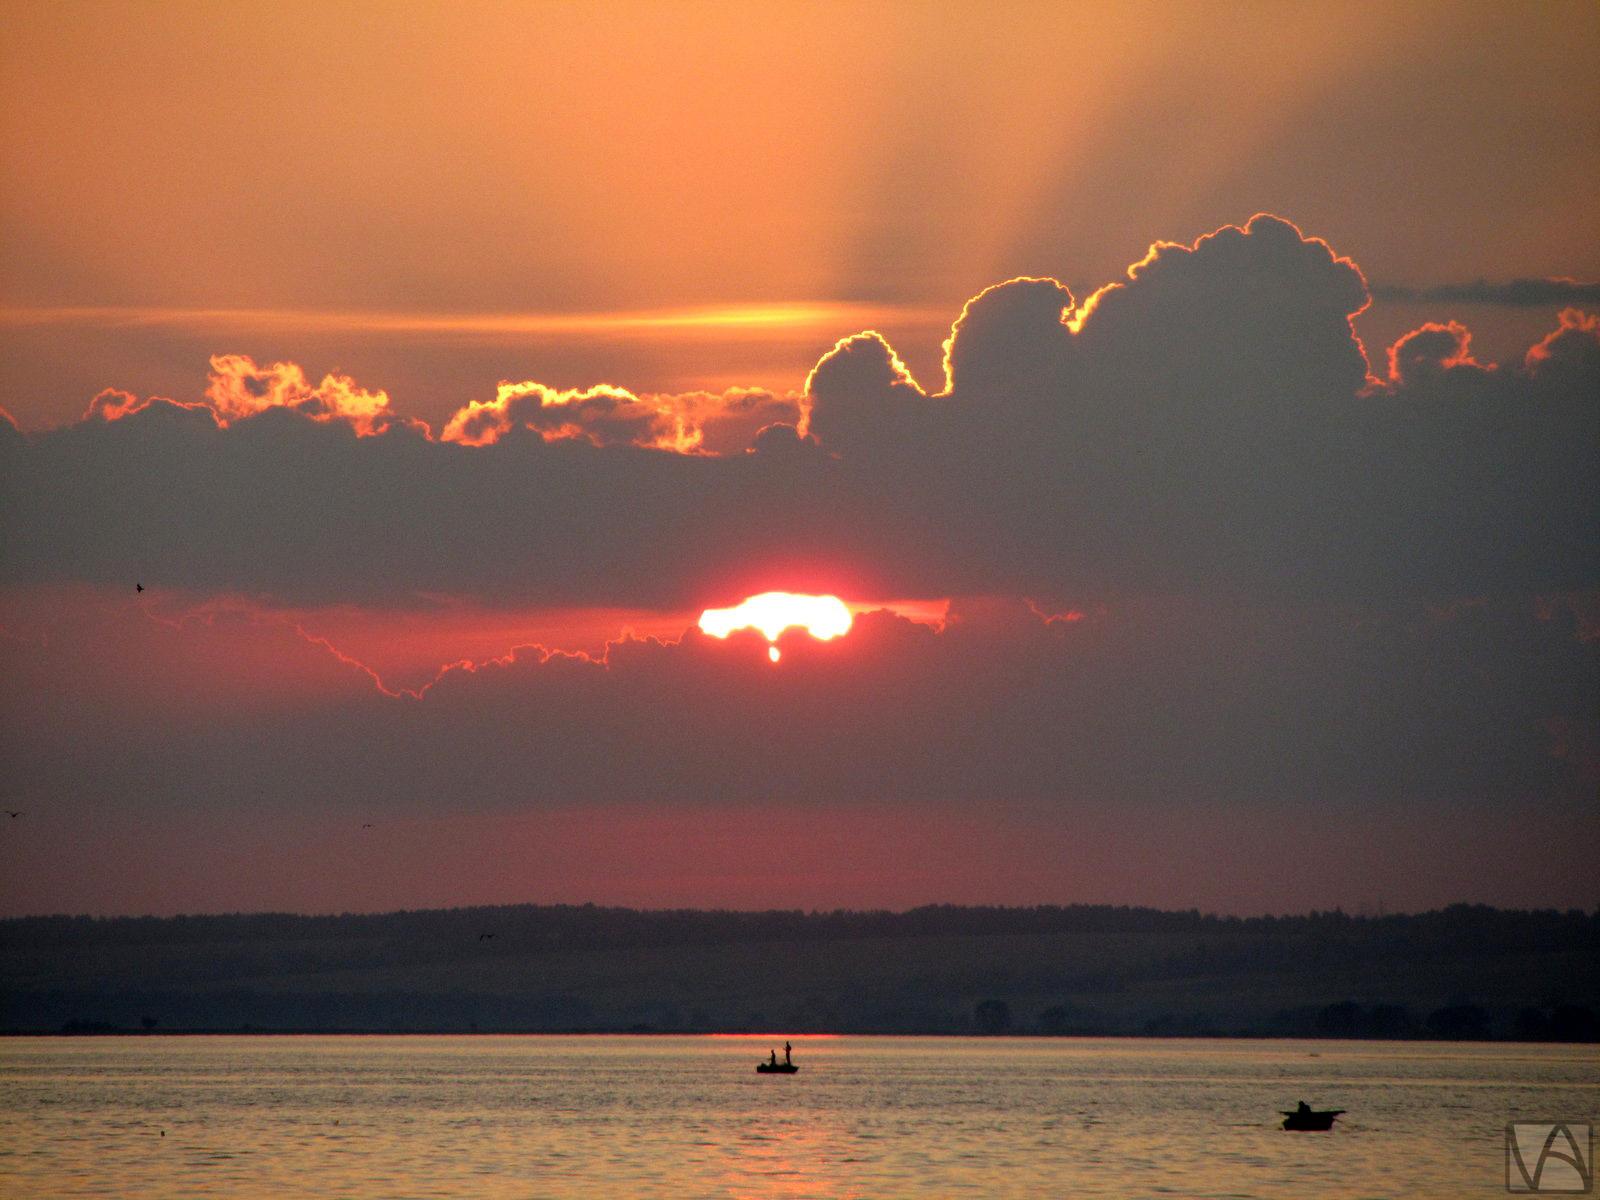 Under the sun by Varnoel-Arisilme